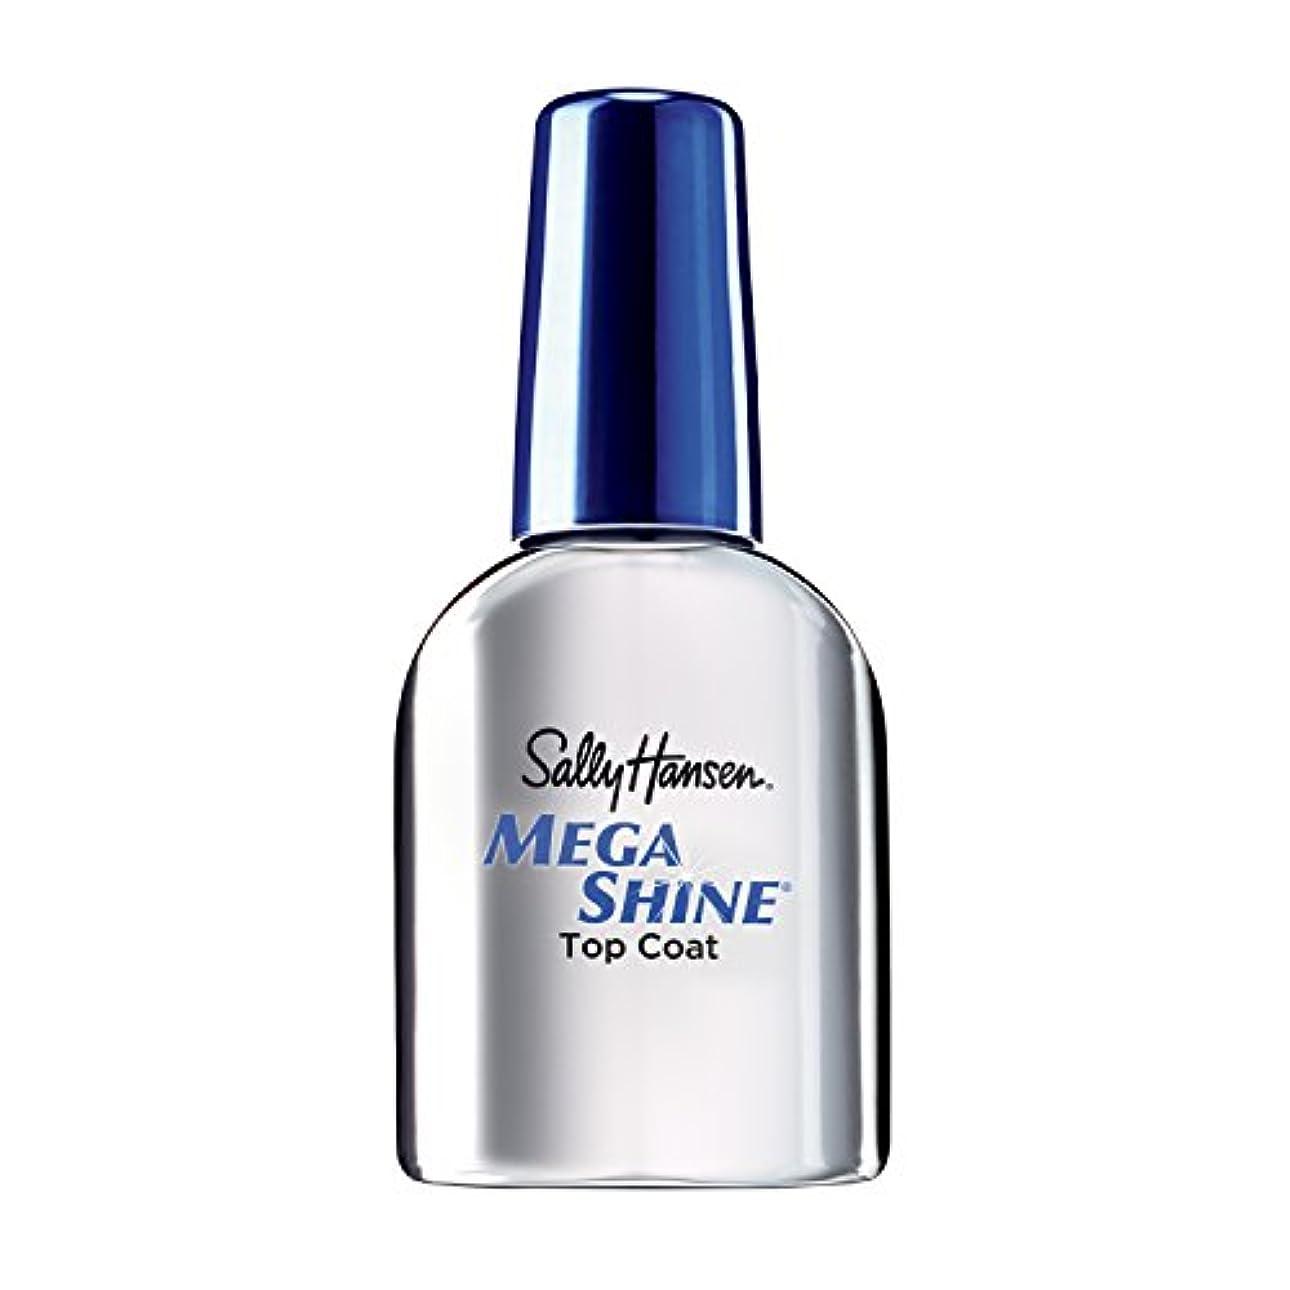 Sally Hansen Mega Shine Top Coat 12.5 ml (並行輸入品)